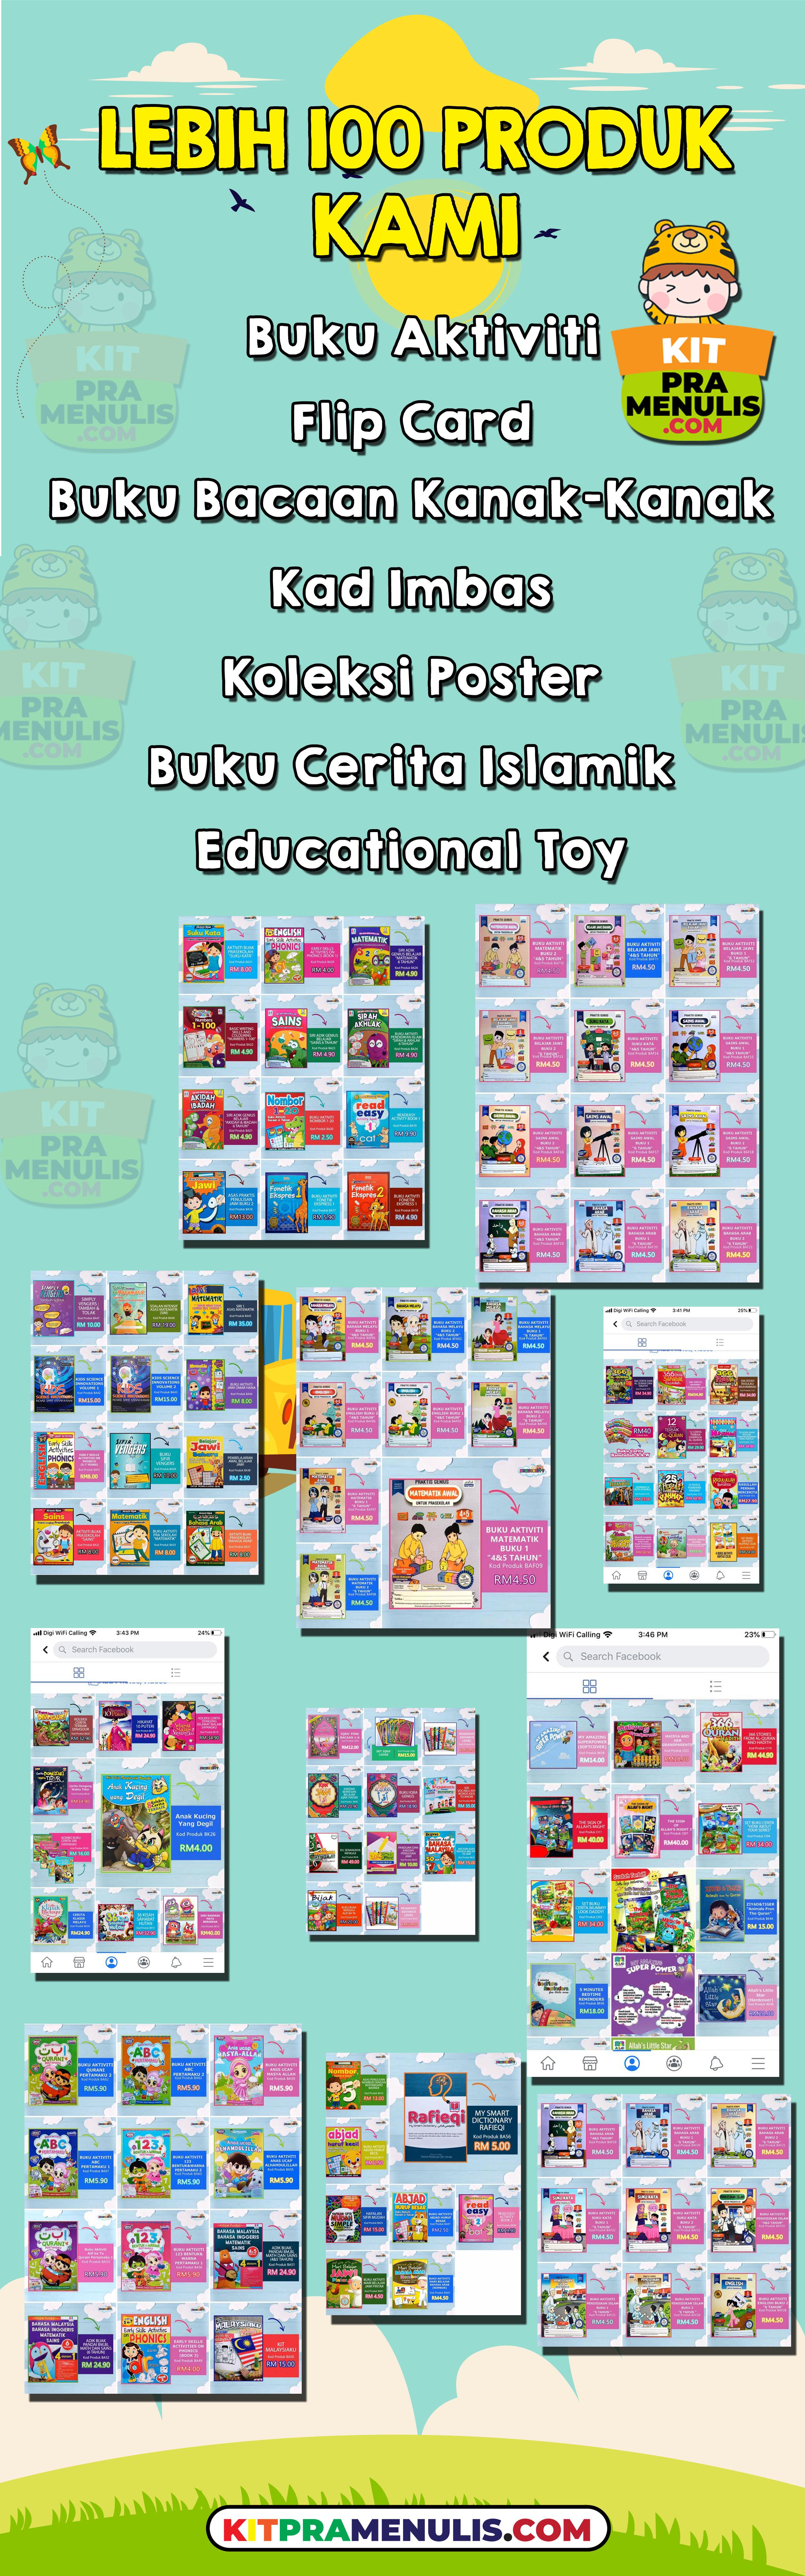 1 Jom Daftar Agen Buku Kanak-Kanak Dan Dapatkan Buku Prasekolah Dengan Harga Murah